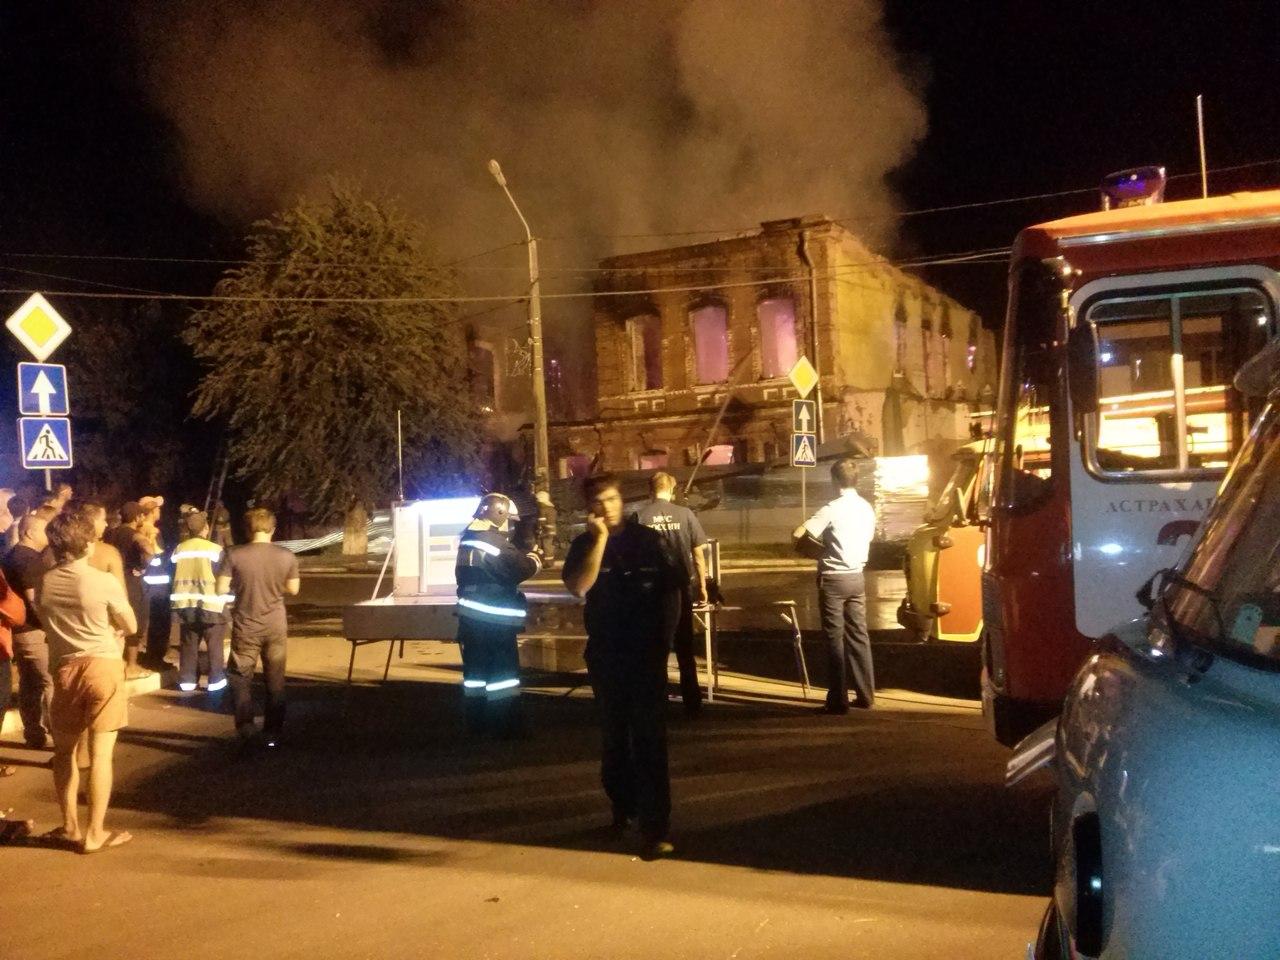 images novosti2 Proisshestviya Pozhar jgsigubl sa Крупный пожар уничтожил два старинных здания в Астрахани